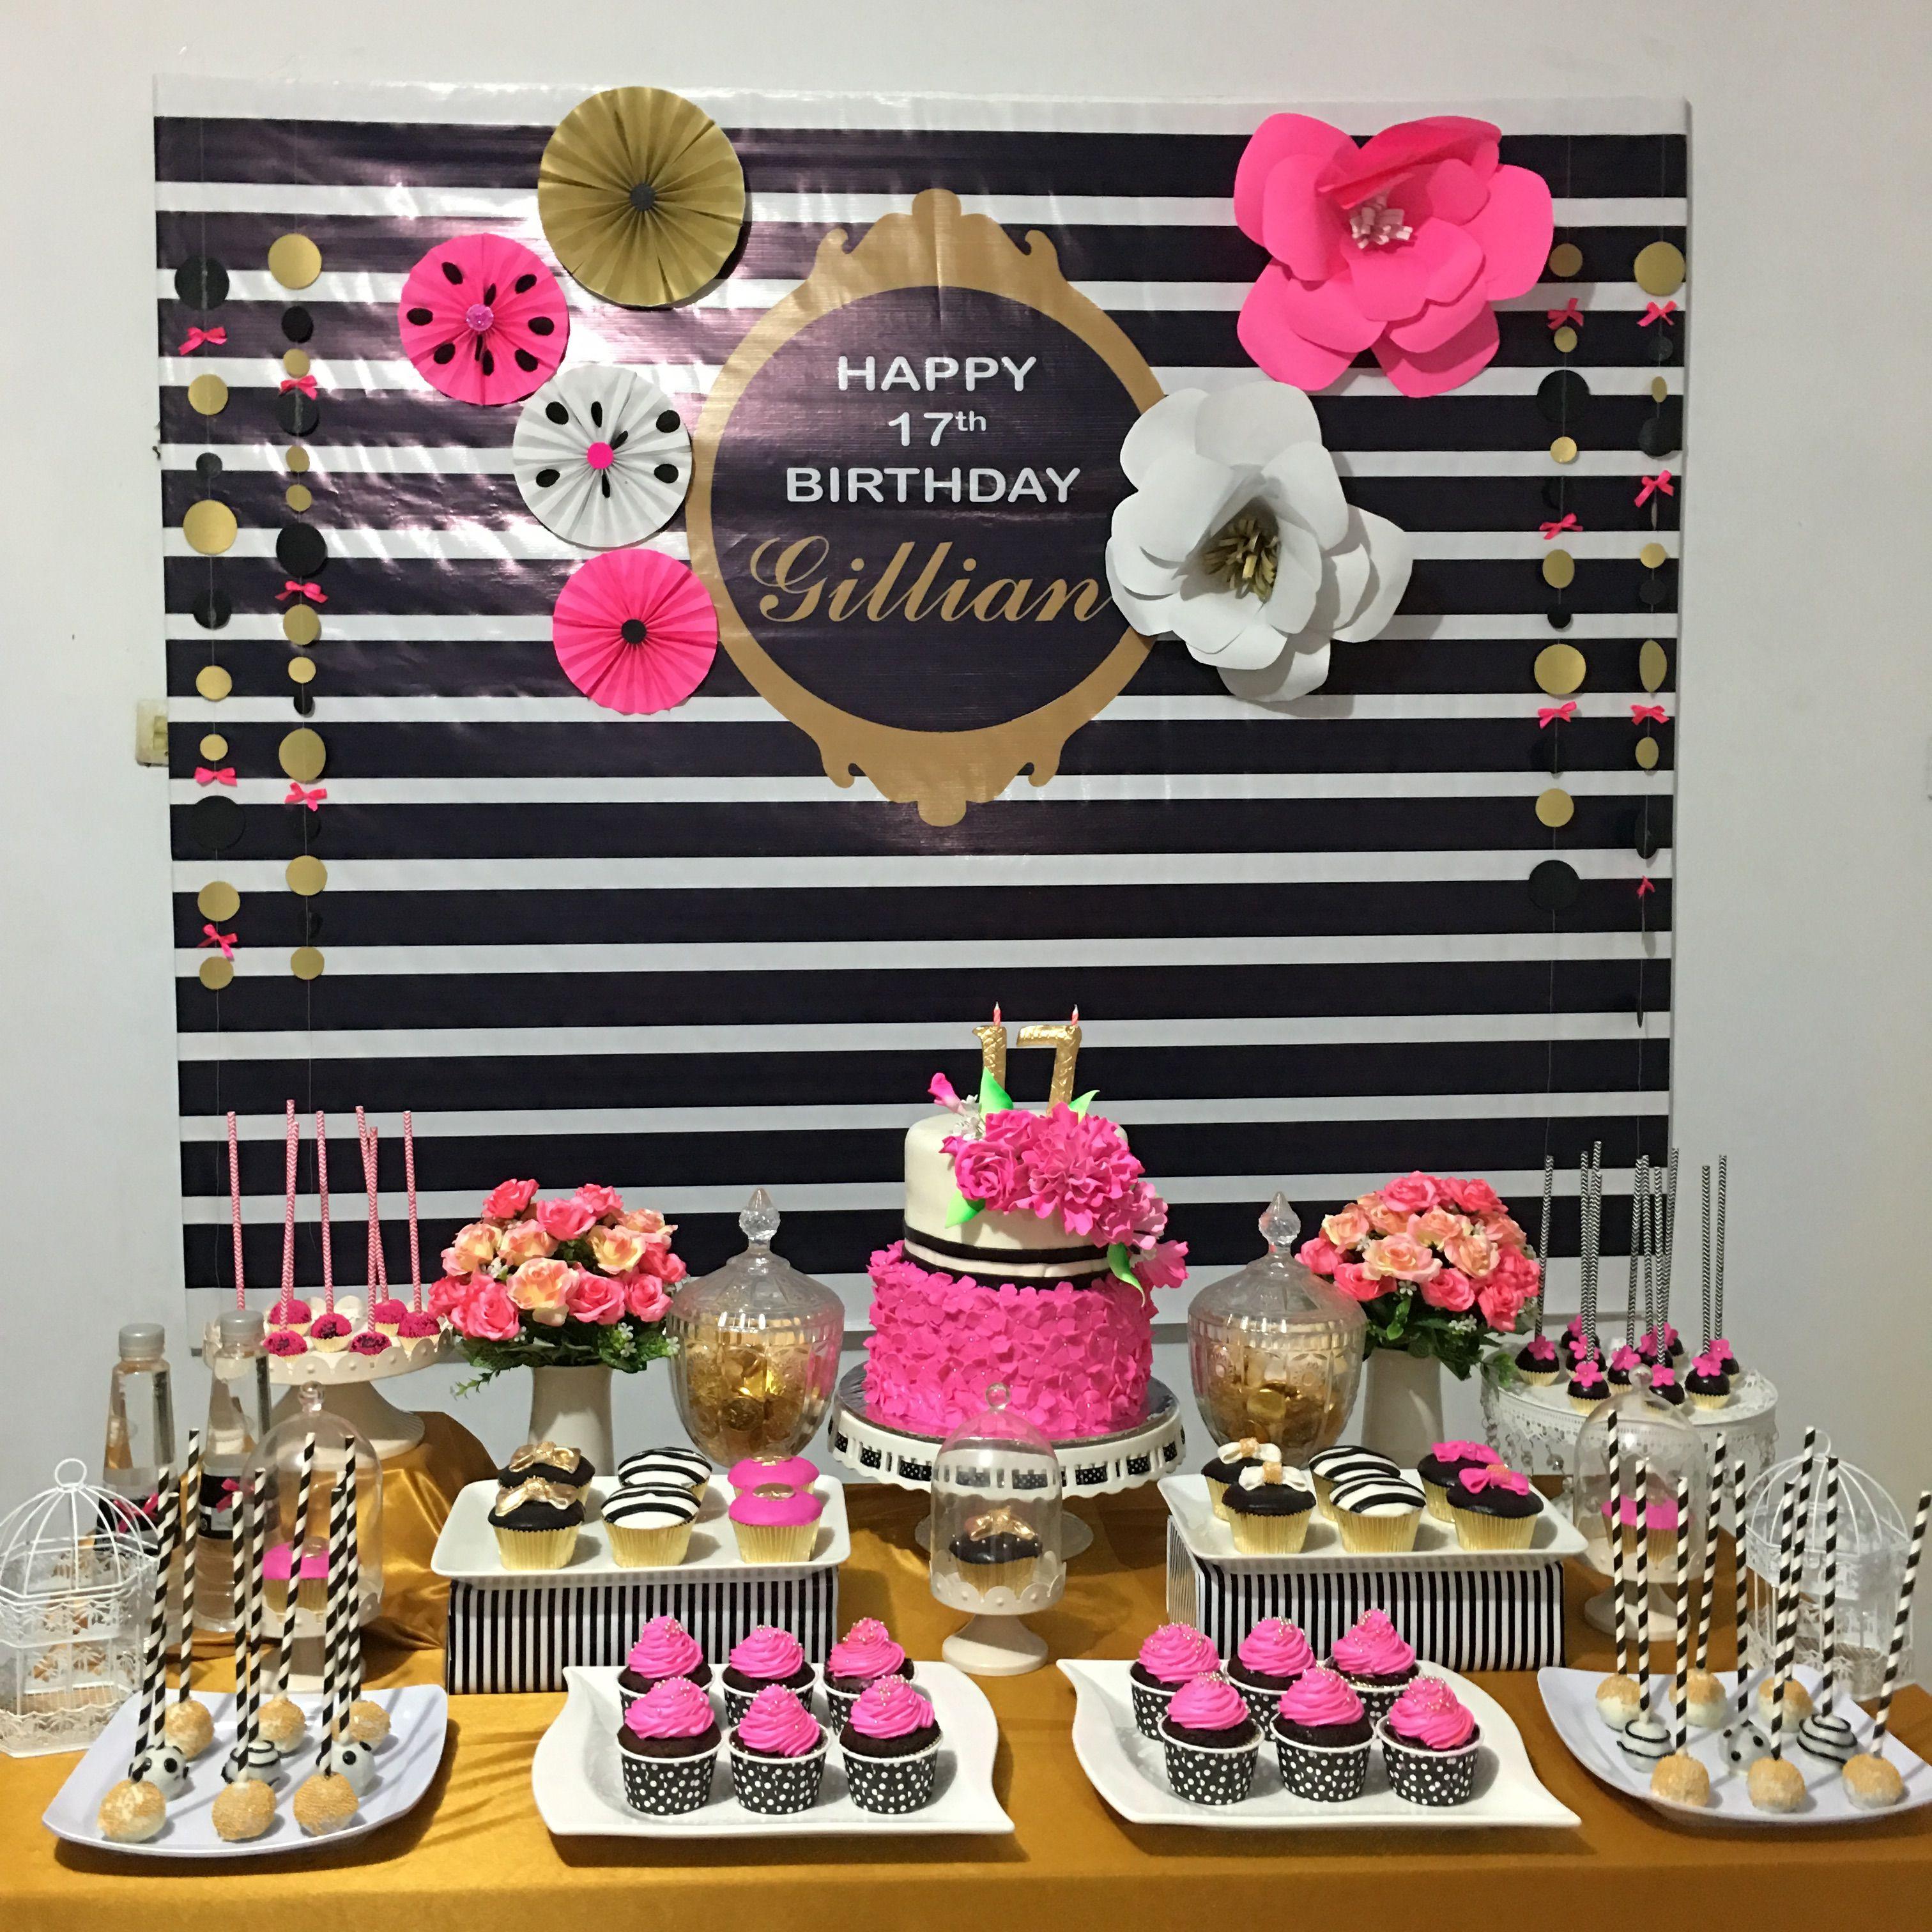 Kate Spade Ideas Dessert Table Birthday Party Decorations 50th Birthday Party 40th Birthday Parties